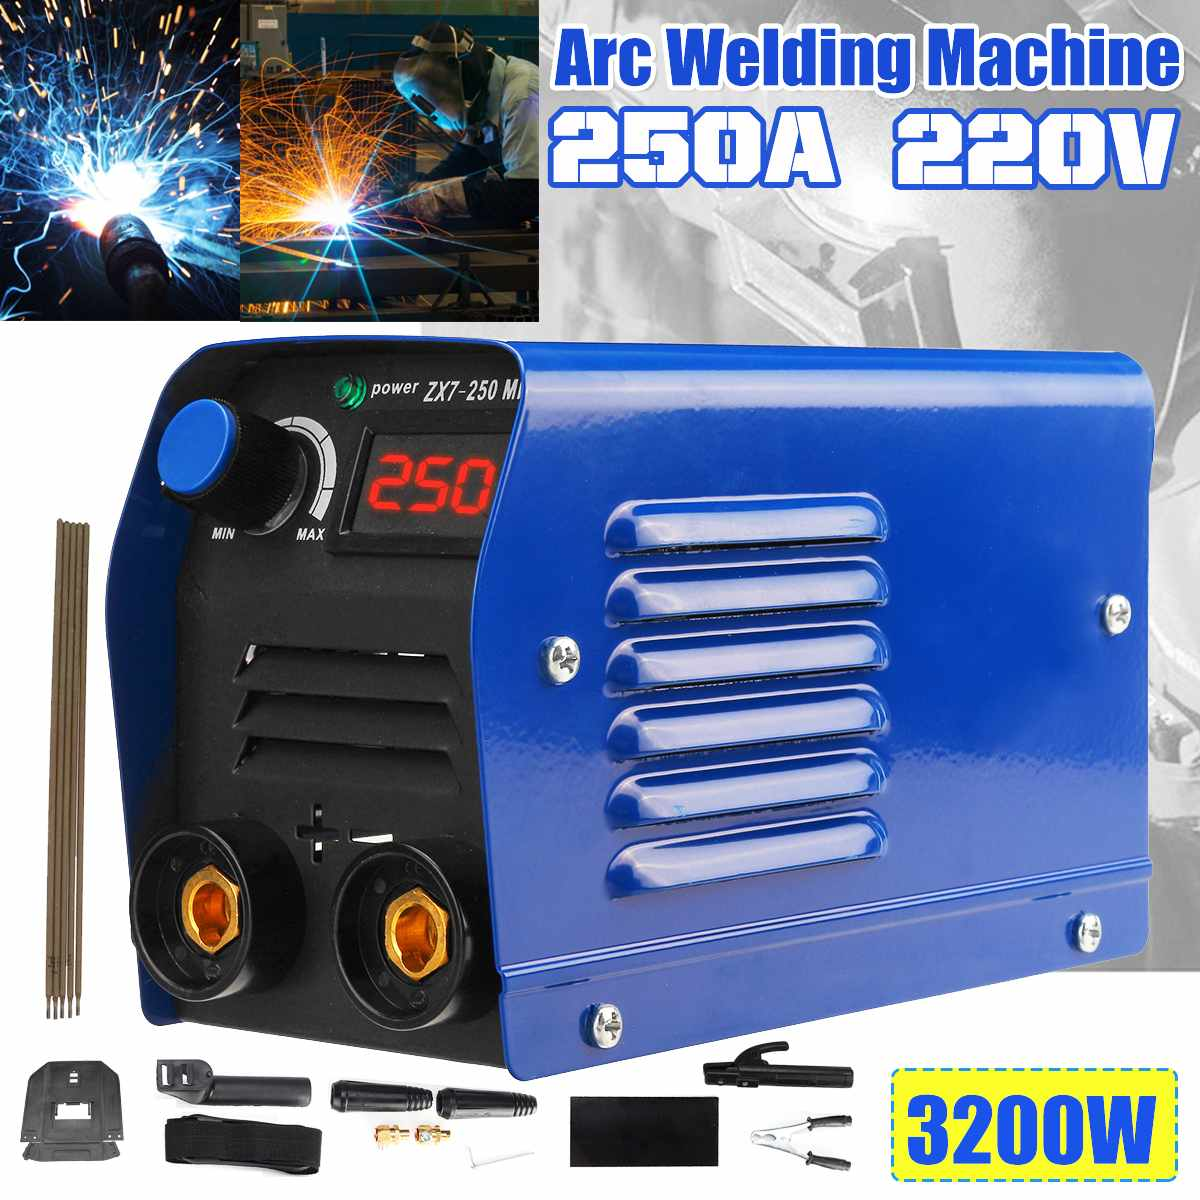 ZX7-250 Arc Welding Machine DC 220V250A Household Pure Copper Portable Welding inverter Electricity welderg tool welder machine